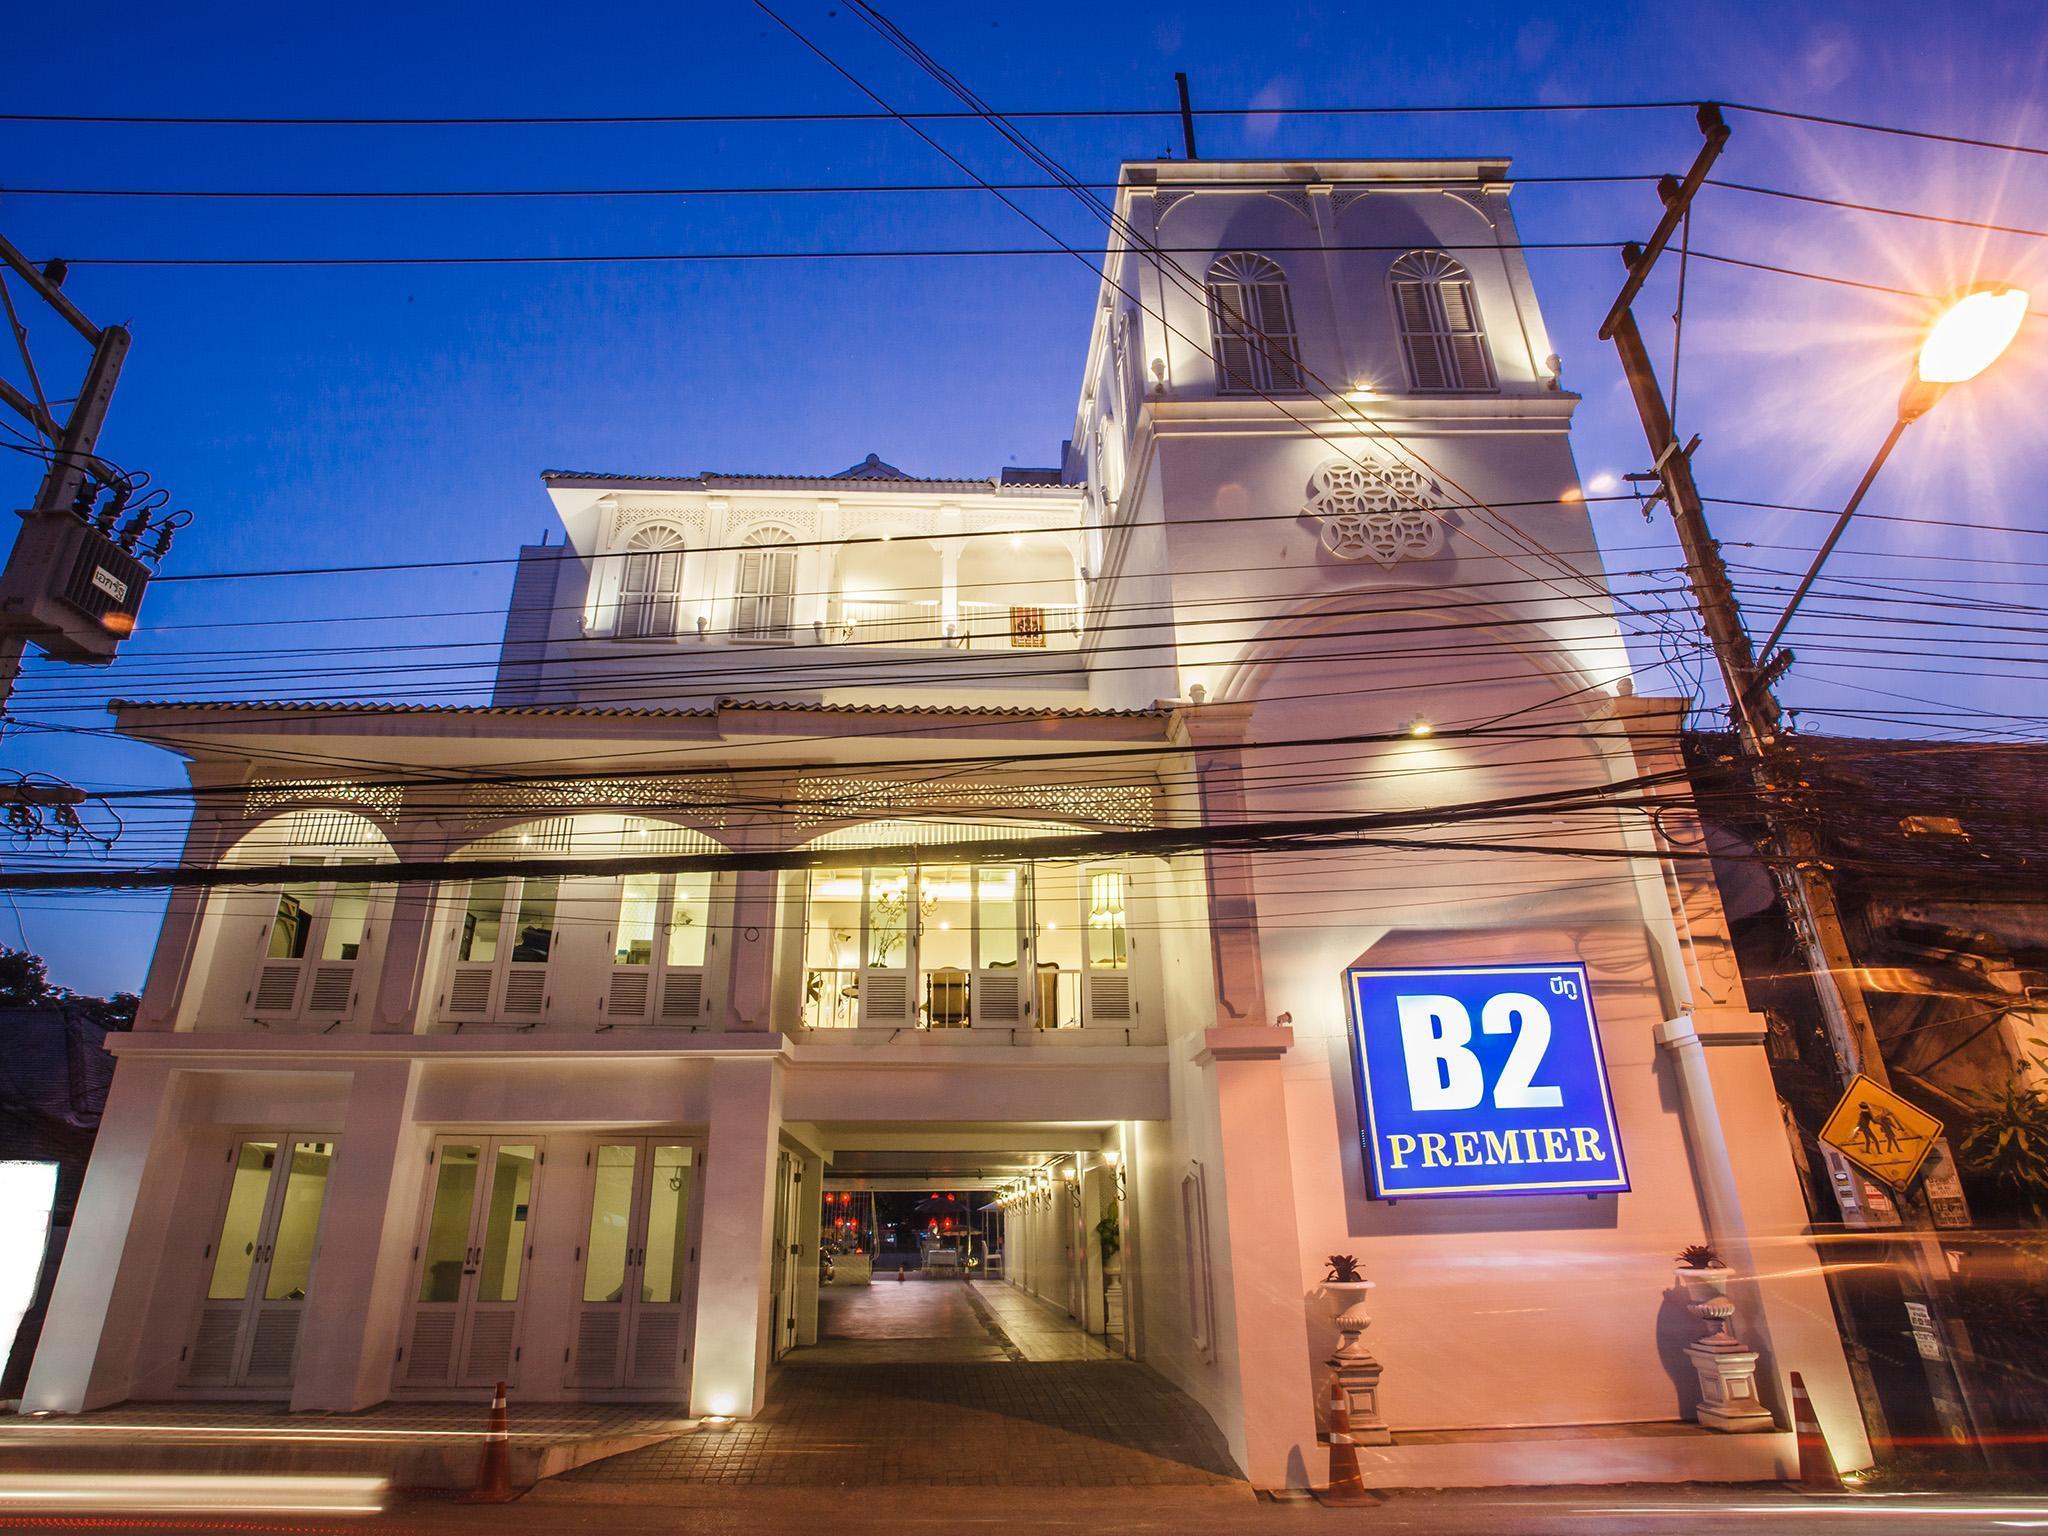 B2 Riverside Colonial Hotel บี2 ริเวอร์ไซด์ โคโลเนียล โฮเต็ล